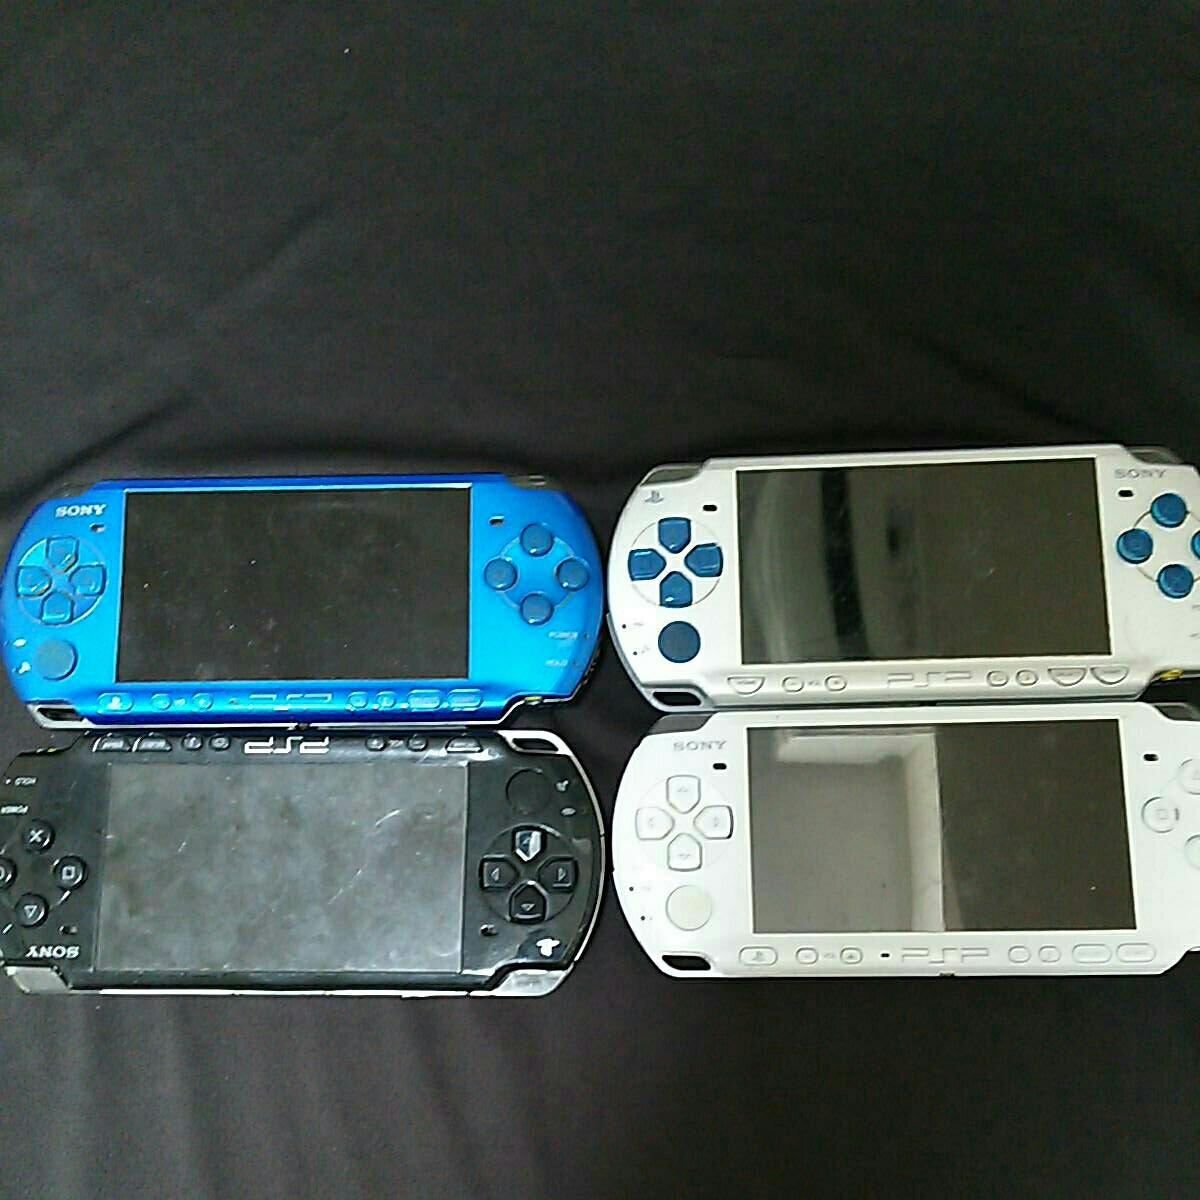 【SONY】PSP 2000 3000 各2台 計4台 ジャンク 動作未確認品